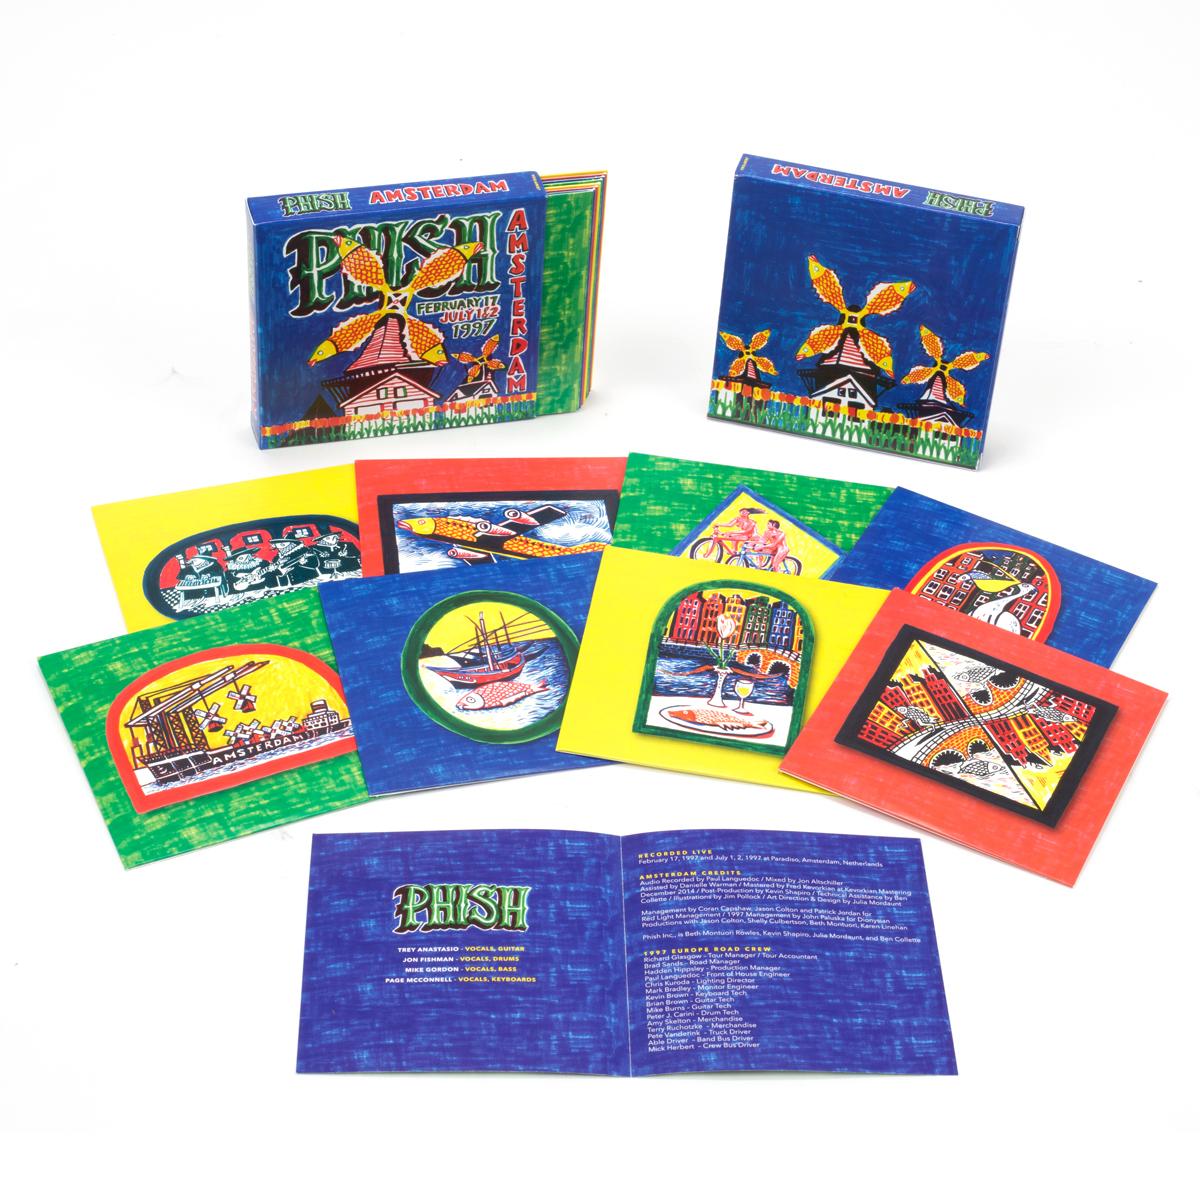 Amsterdam 8-CD Box Set